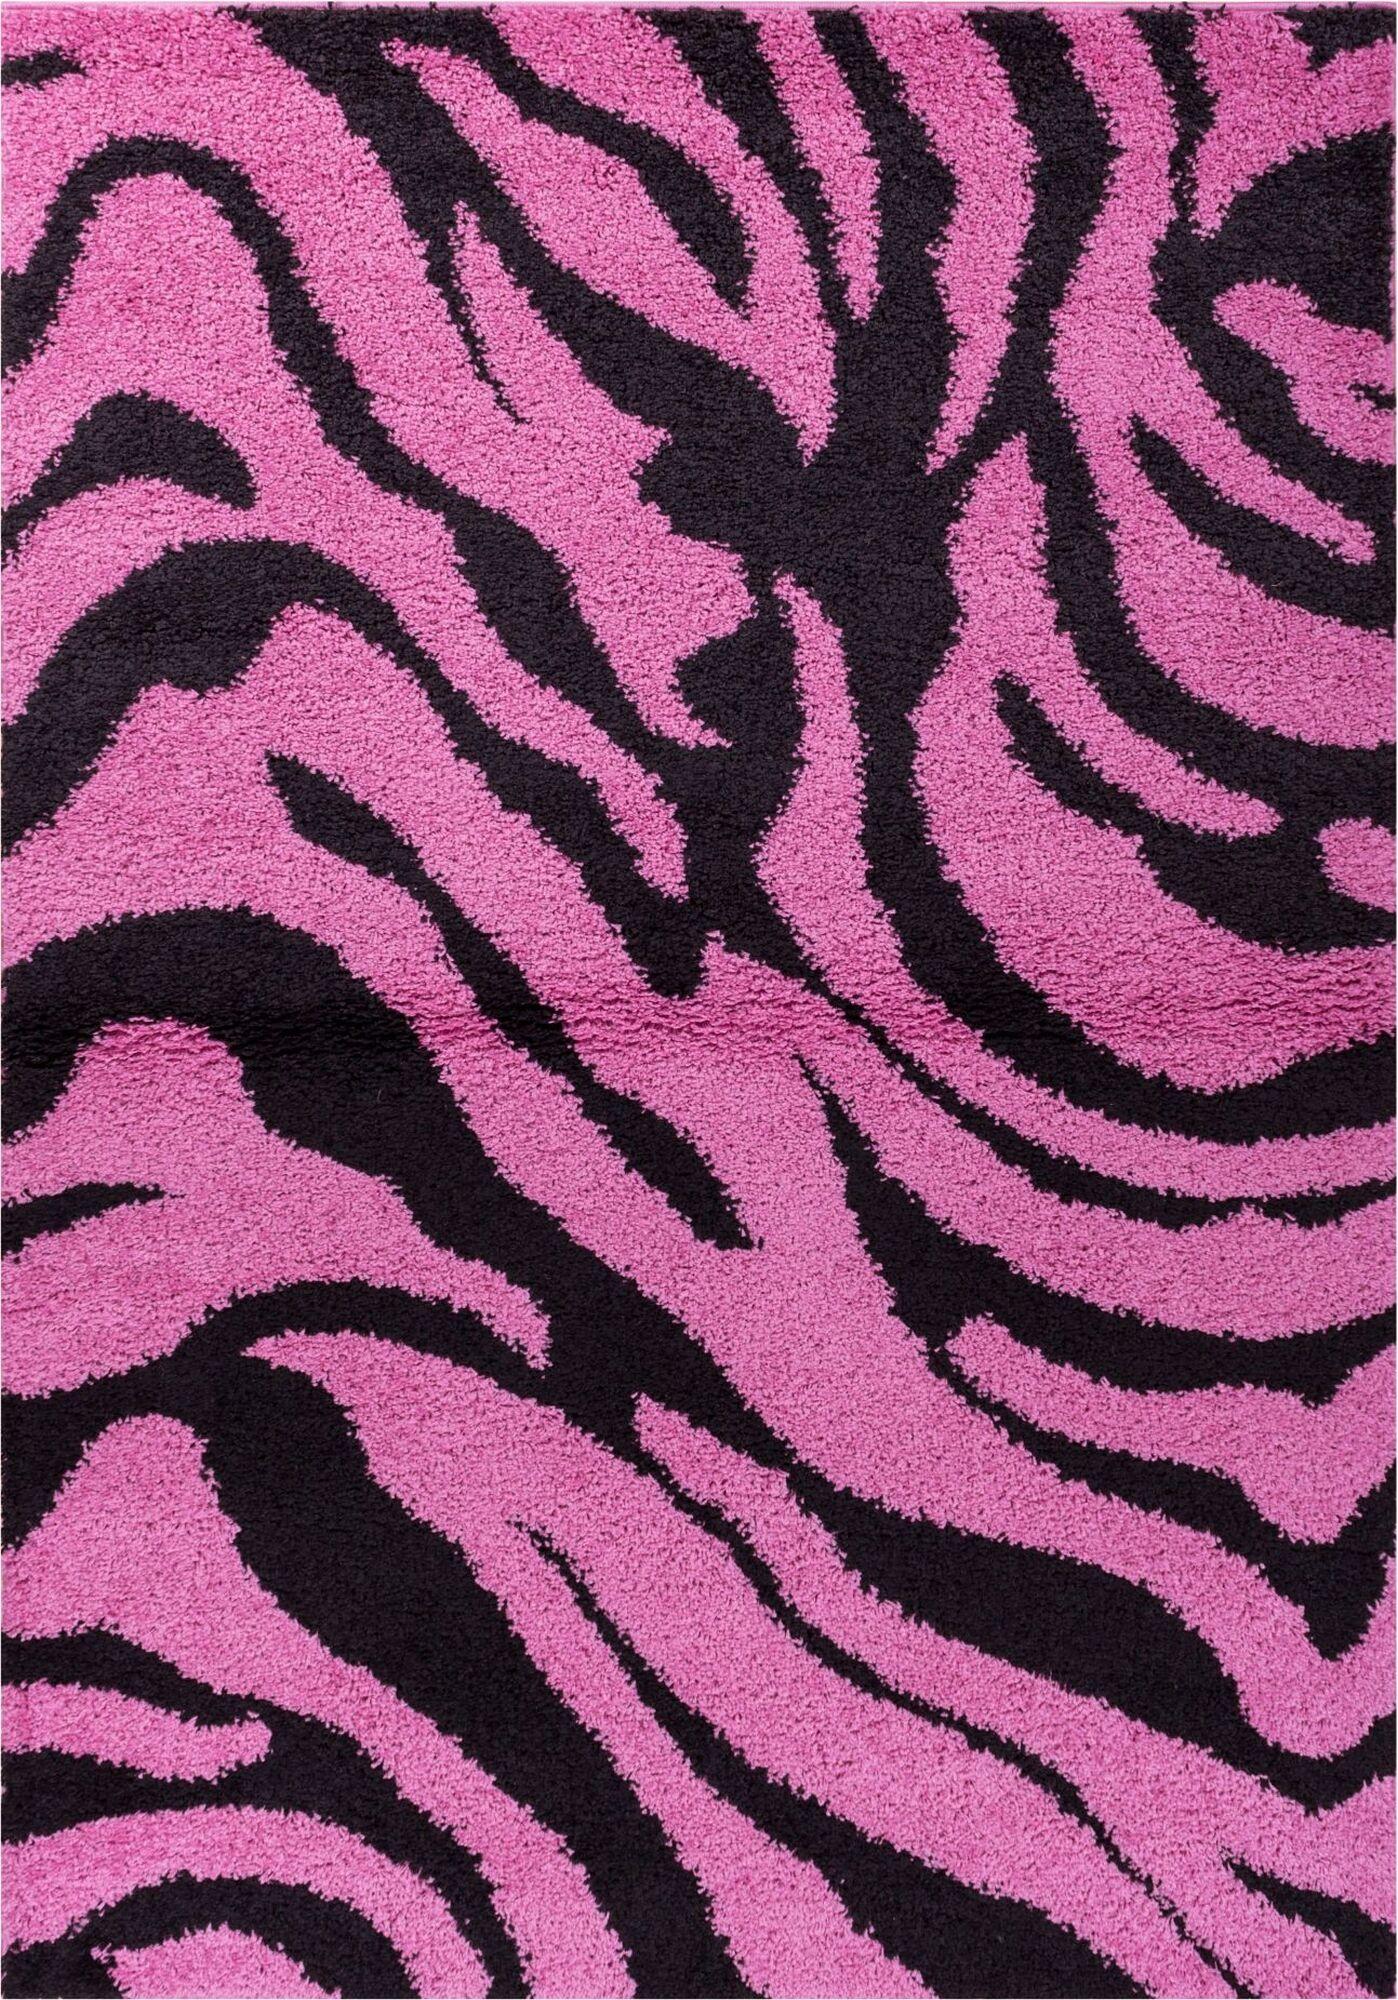 Reynolds Zebra Animal Print Fuchsia/Black Area Rug Rug Size: 5' x 7'2